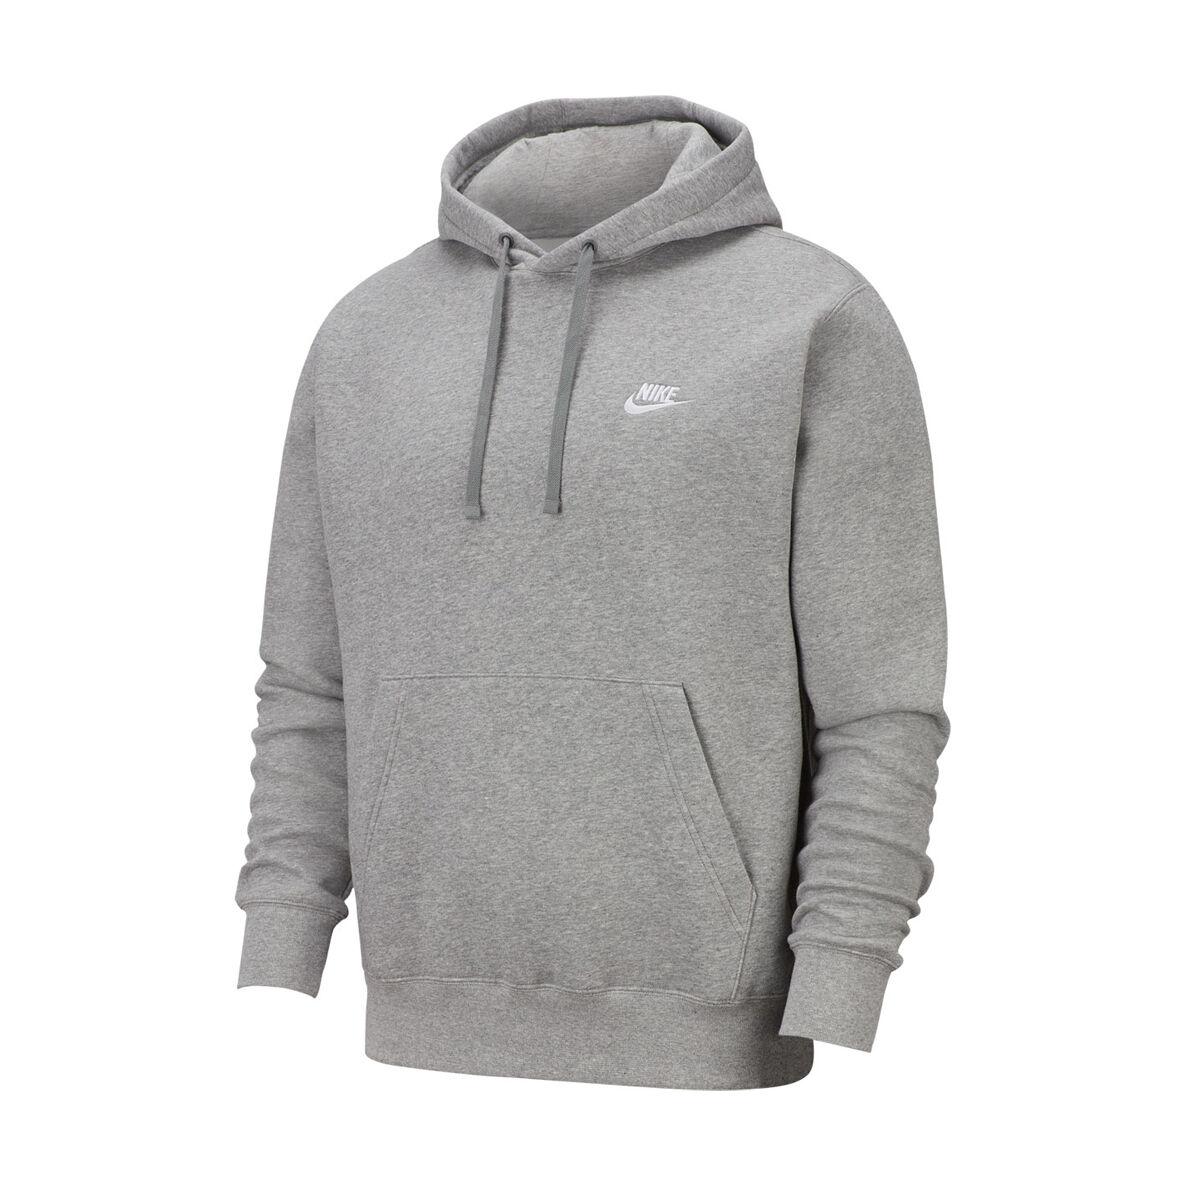 Nike Sportswear Mens Club Fleece Hoodie